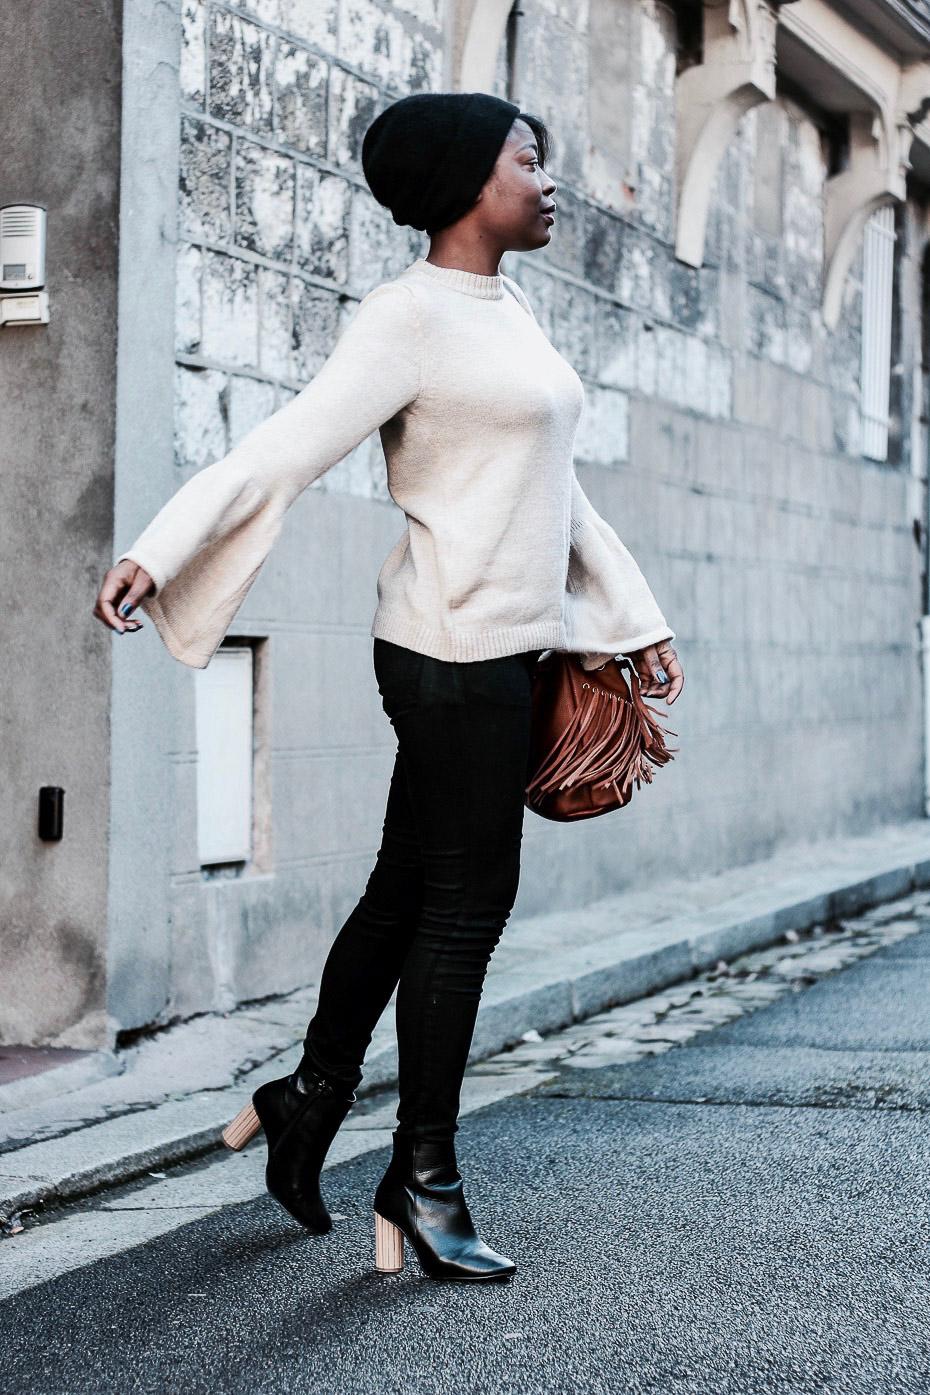 soyons-honnetes-blog-mode-chic-et-tendance